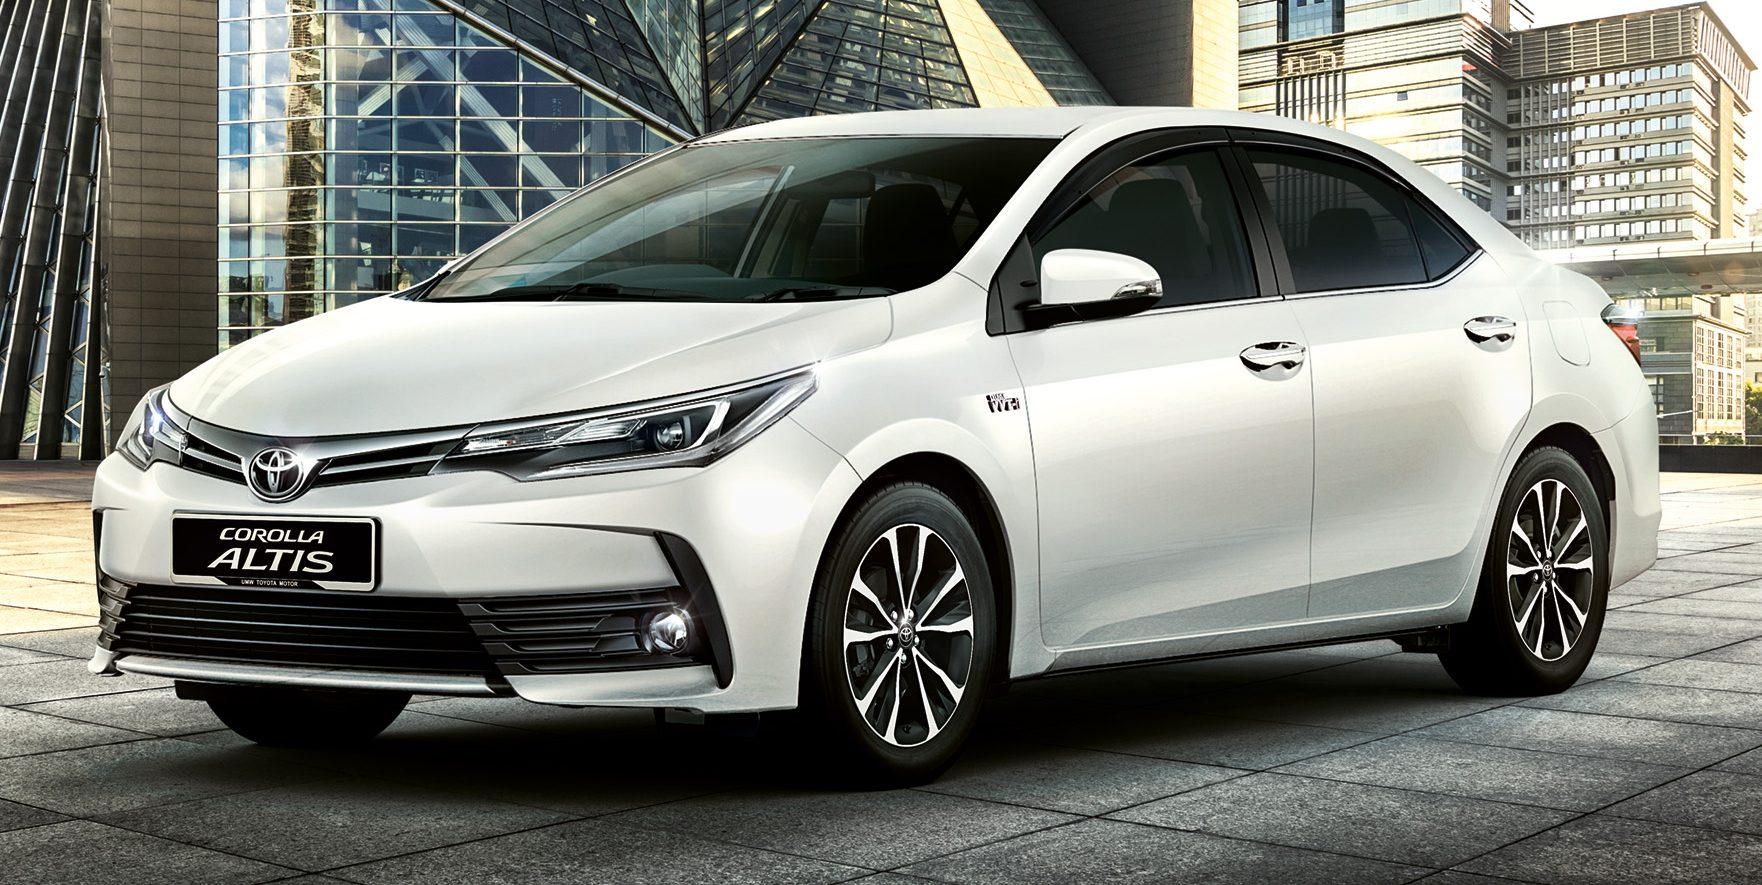 Toyota Corolla Altis 小改款开放预订 配备升级价格不变。 Toyota Altis